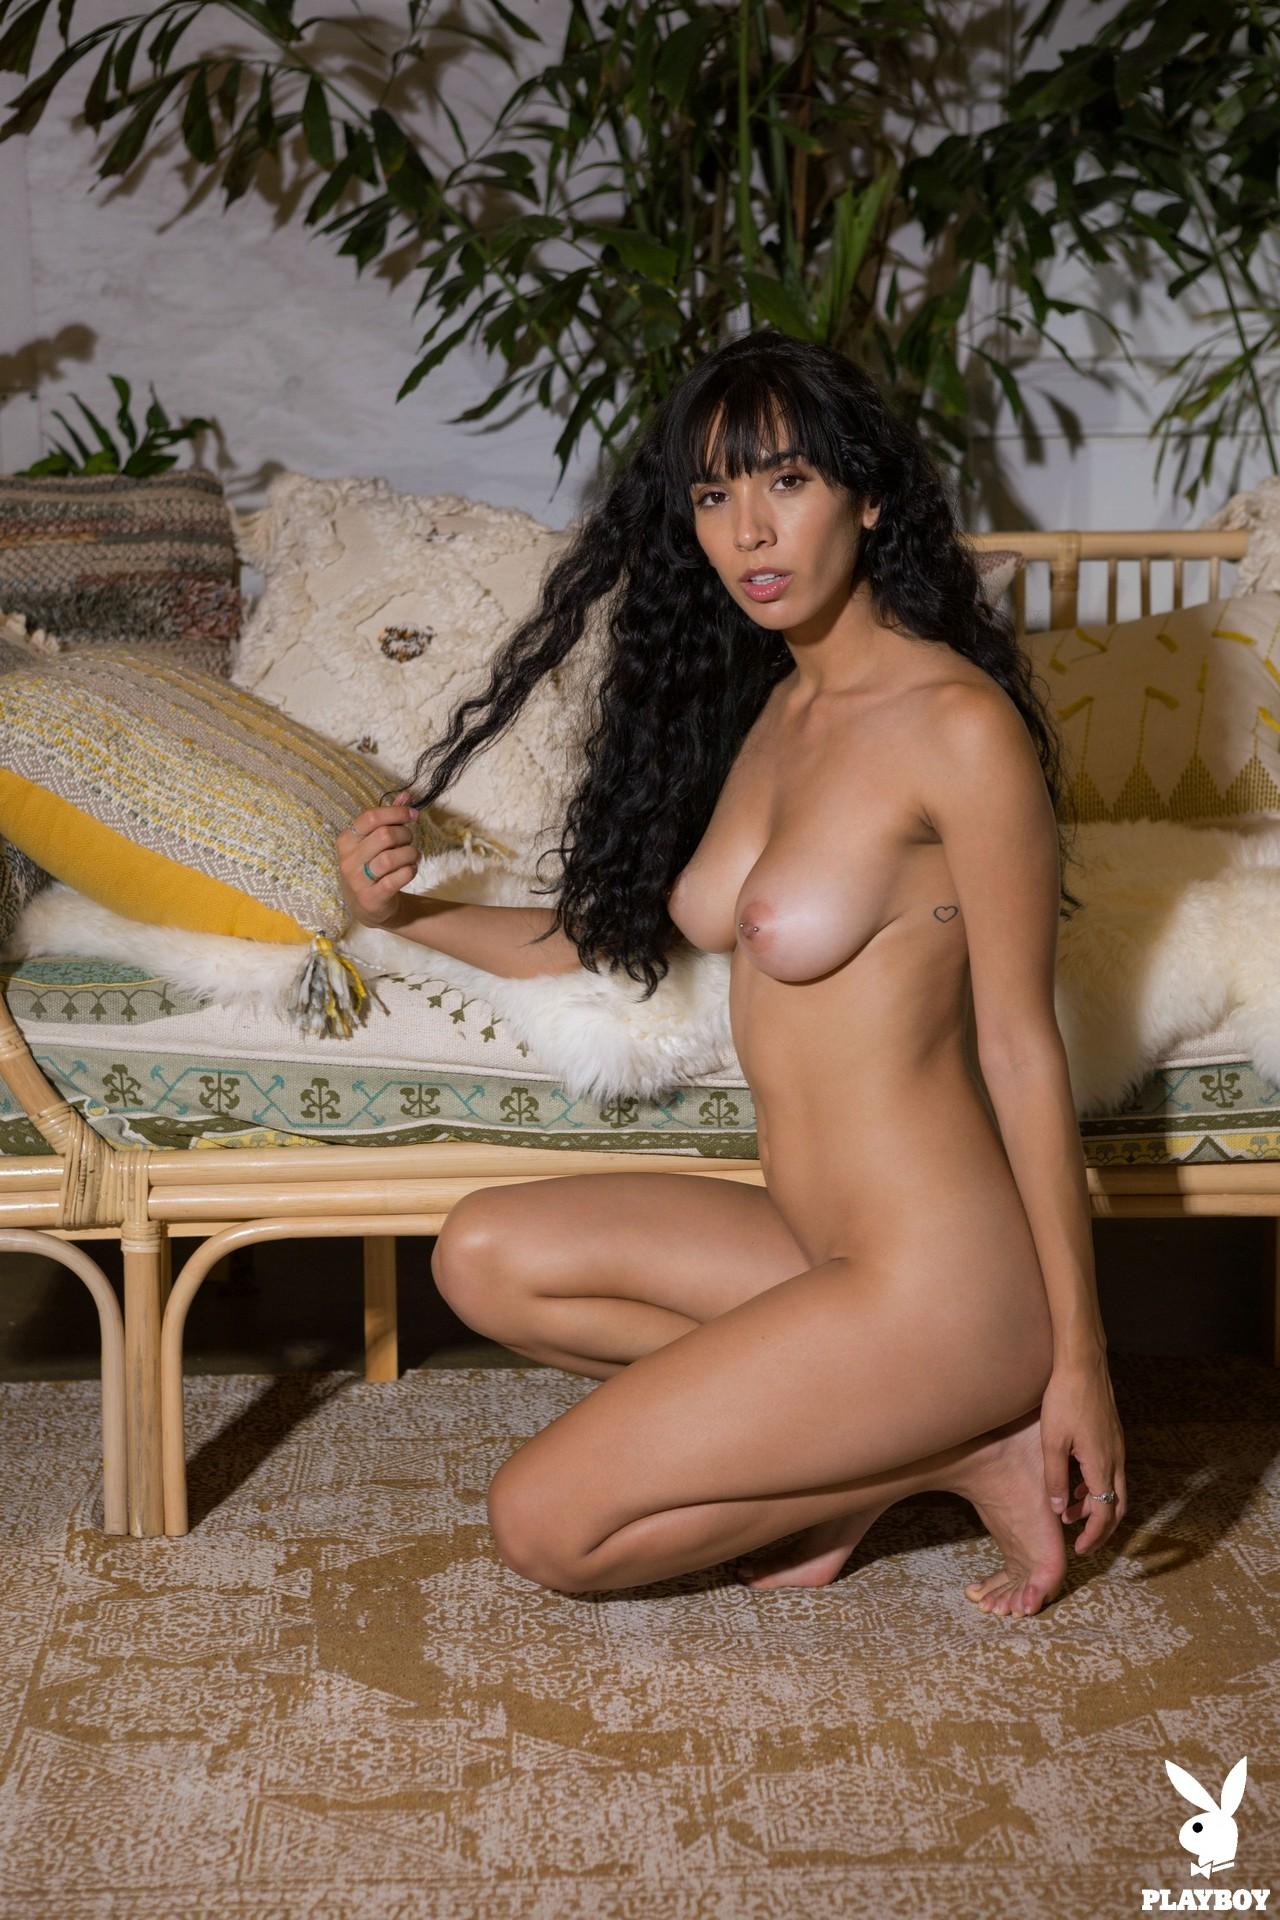 Erika De Leija in Perfect Daydream - Playboy Plus 23